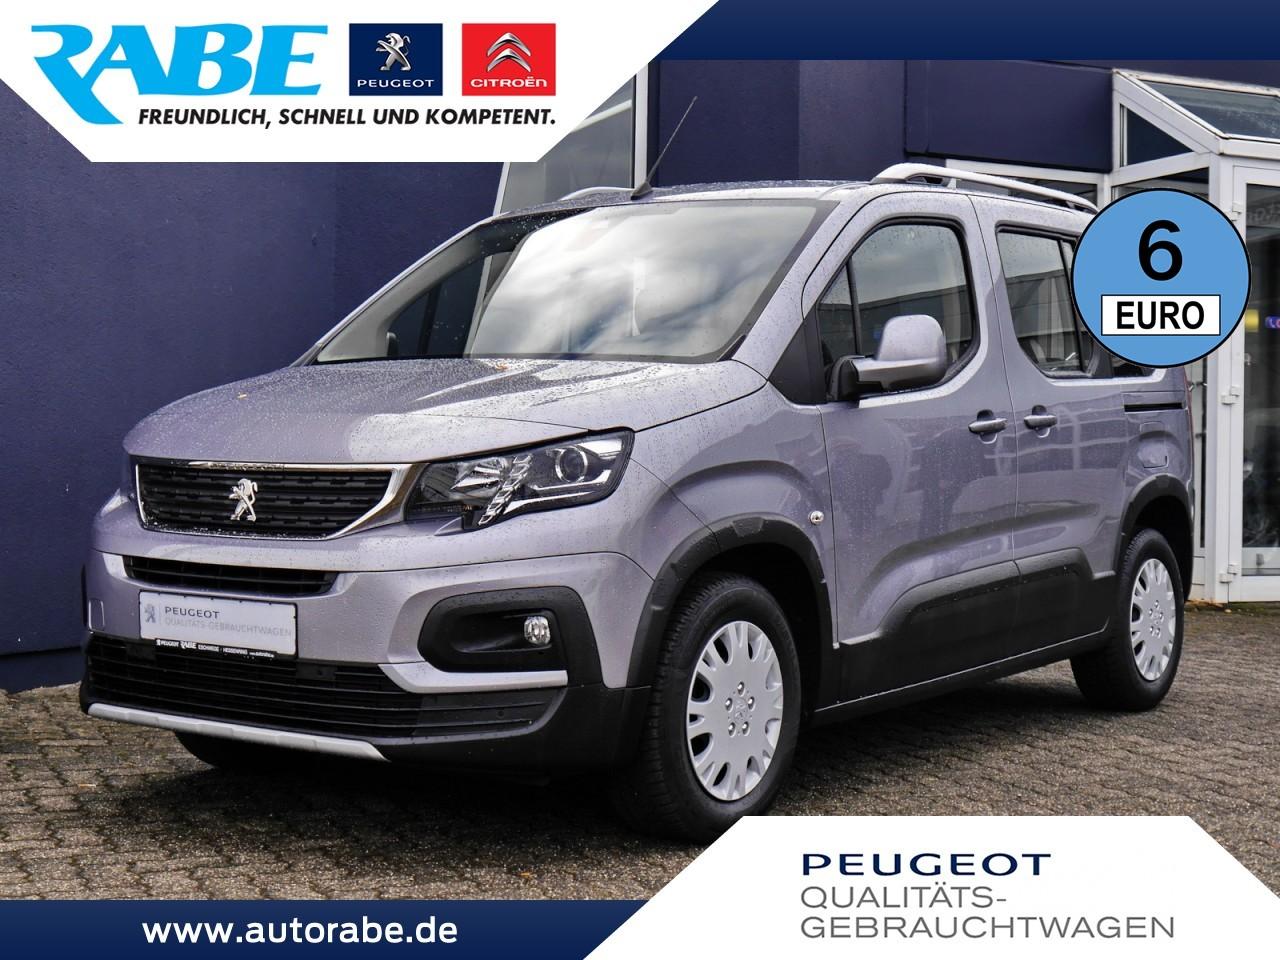 Peugeot Rifter Allure 100 BlueHDi Klimaaut.+DAB+PDC+Alu, Jahr 2018, Diesel